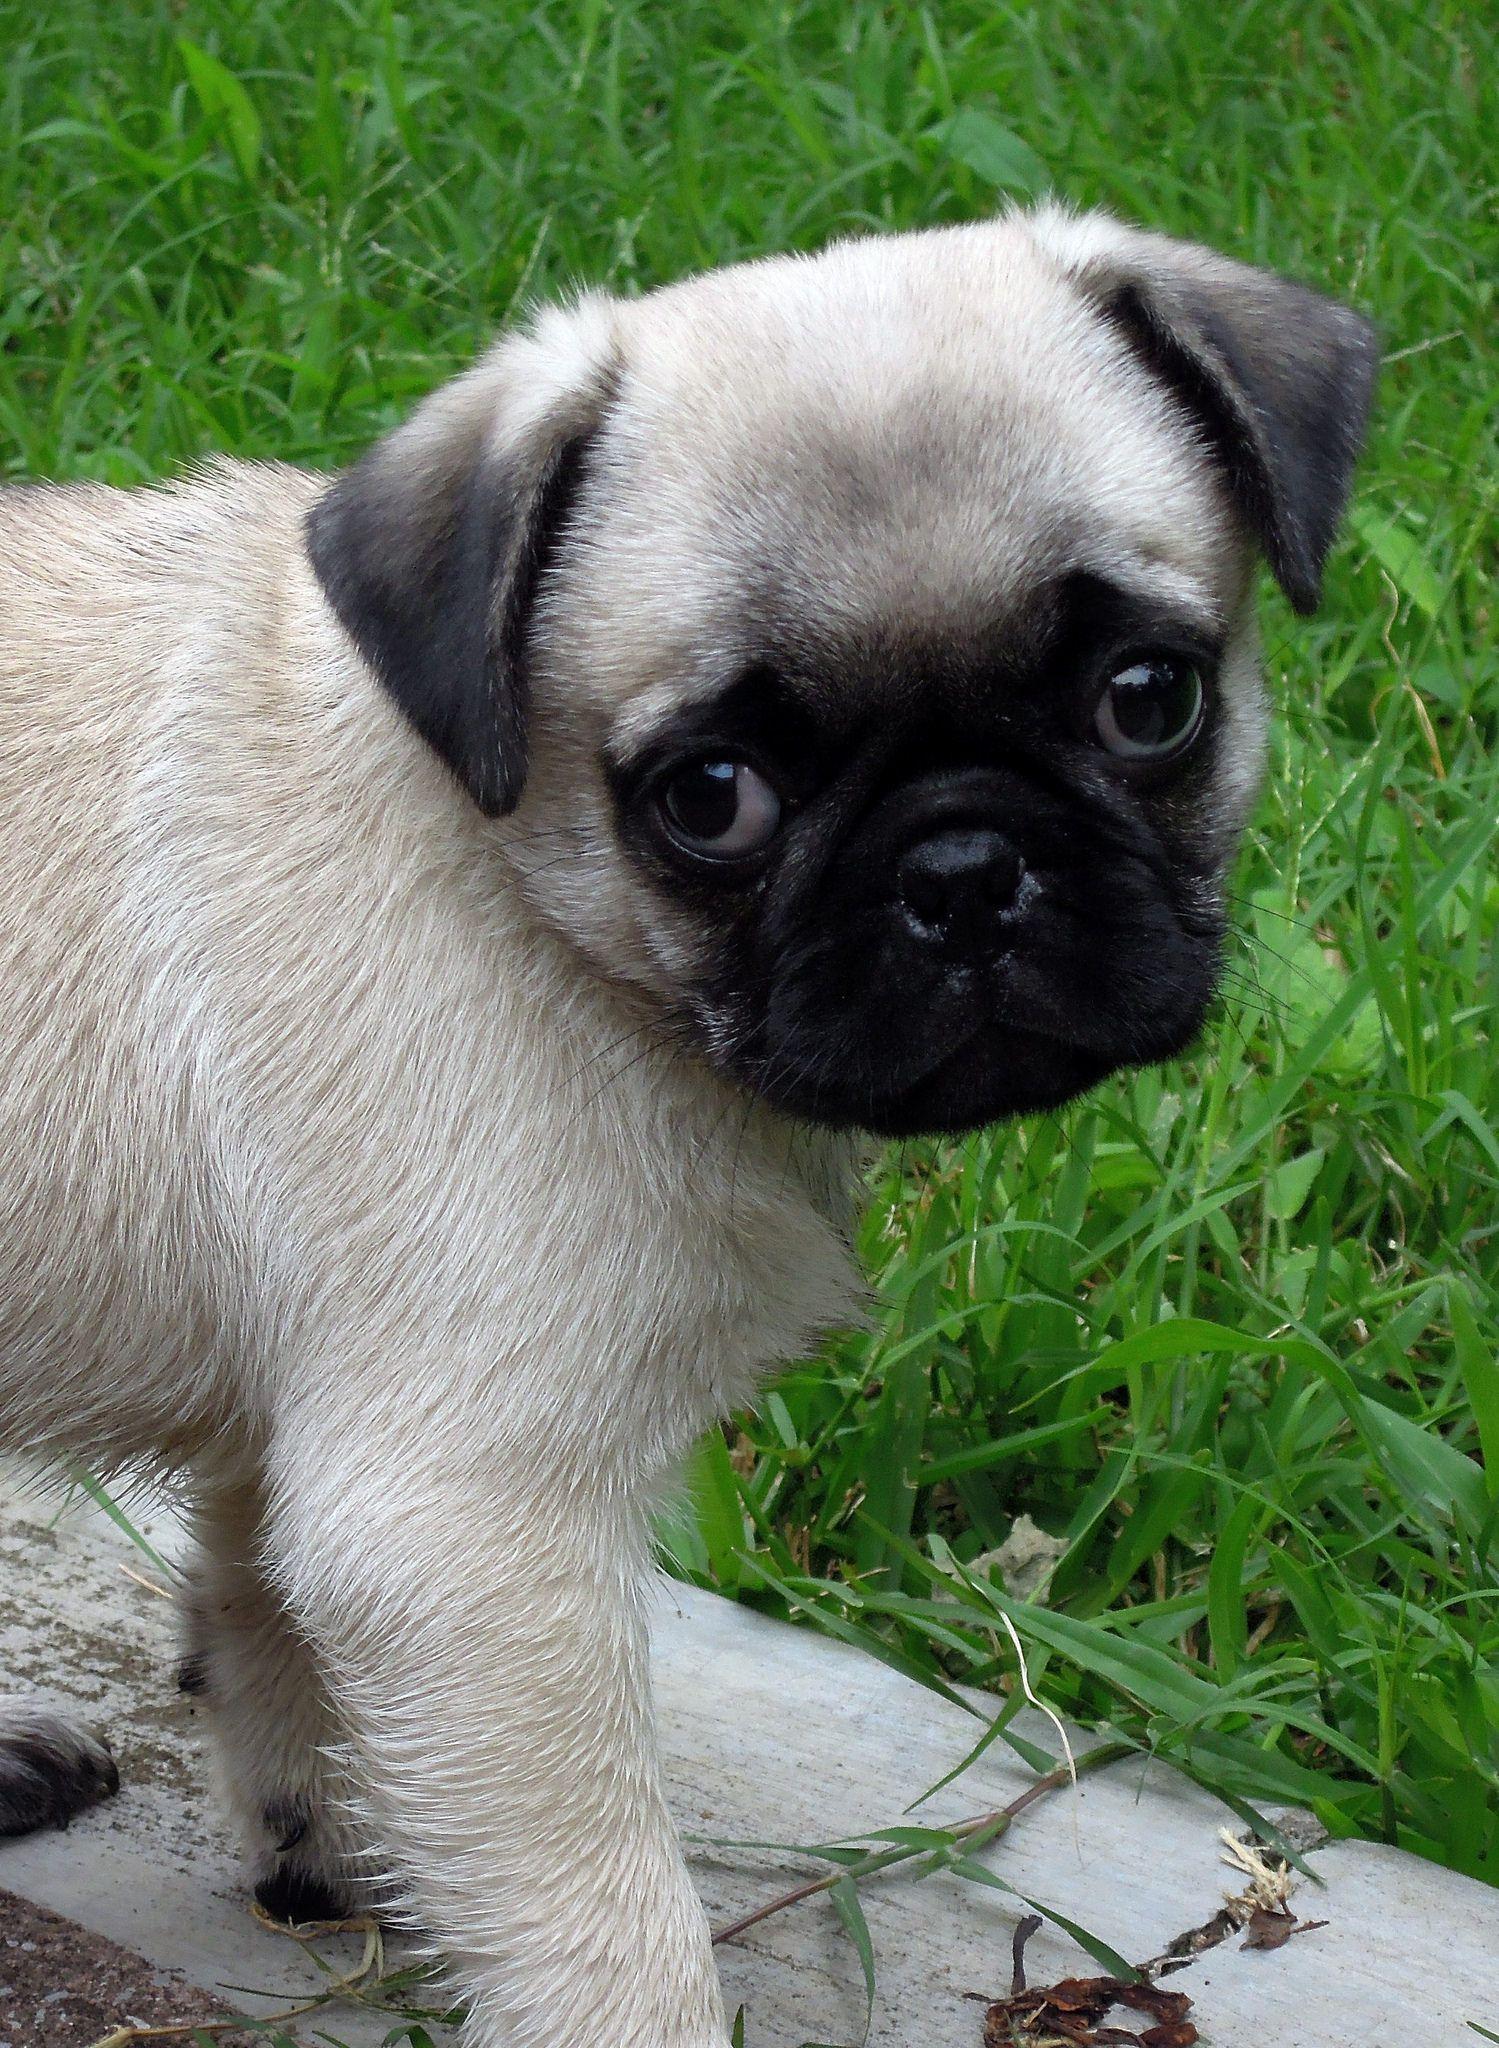 Marcus Black Pug Puppies Baby Pugs Pug Puppies